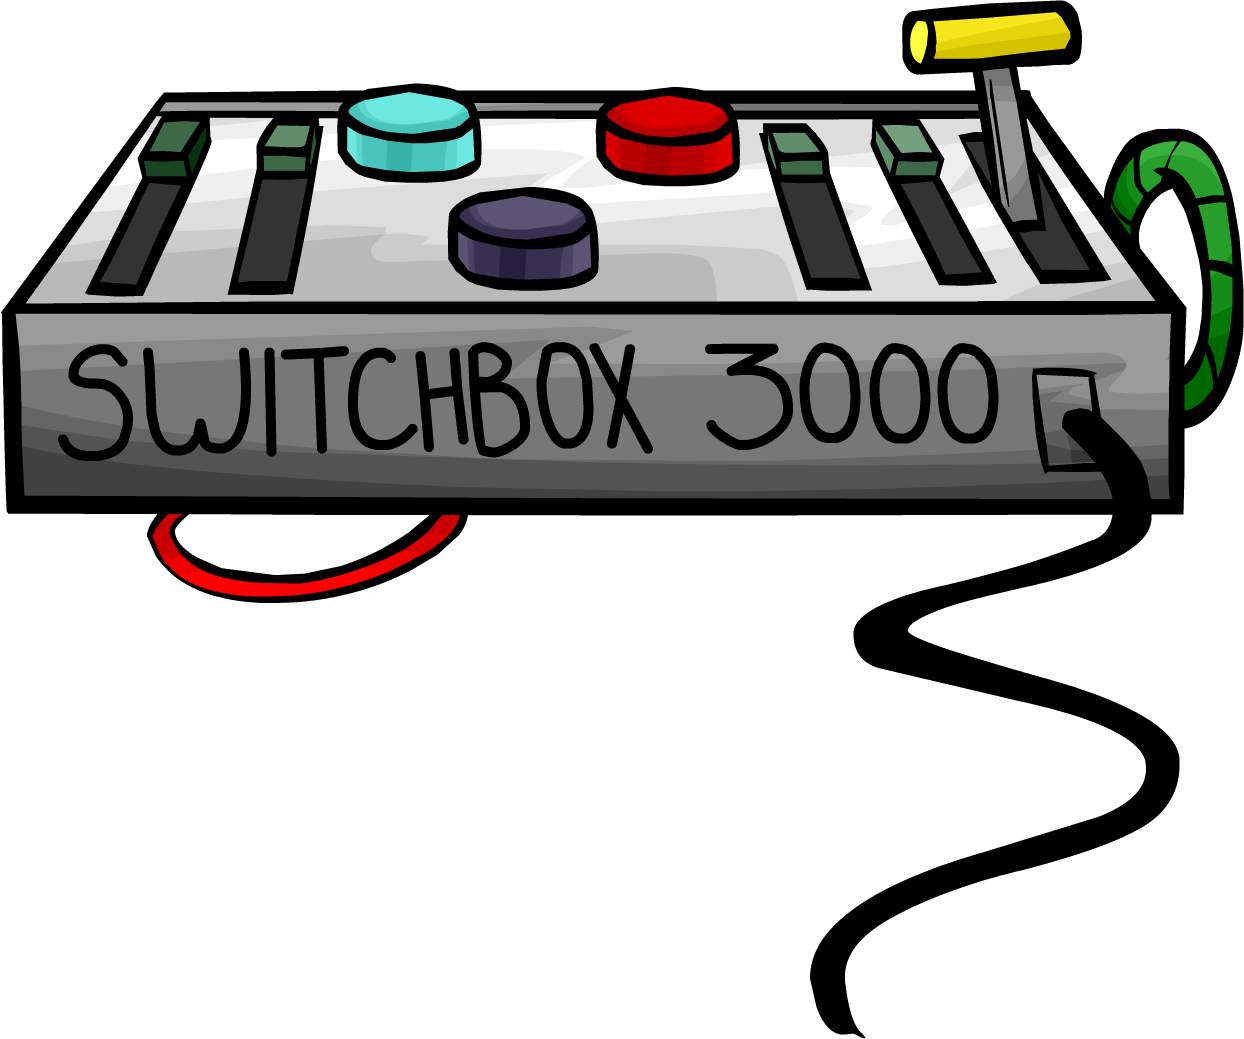 Switchbox 3000